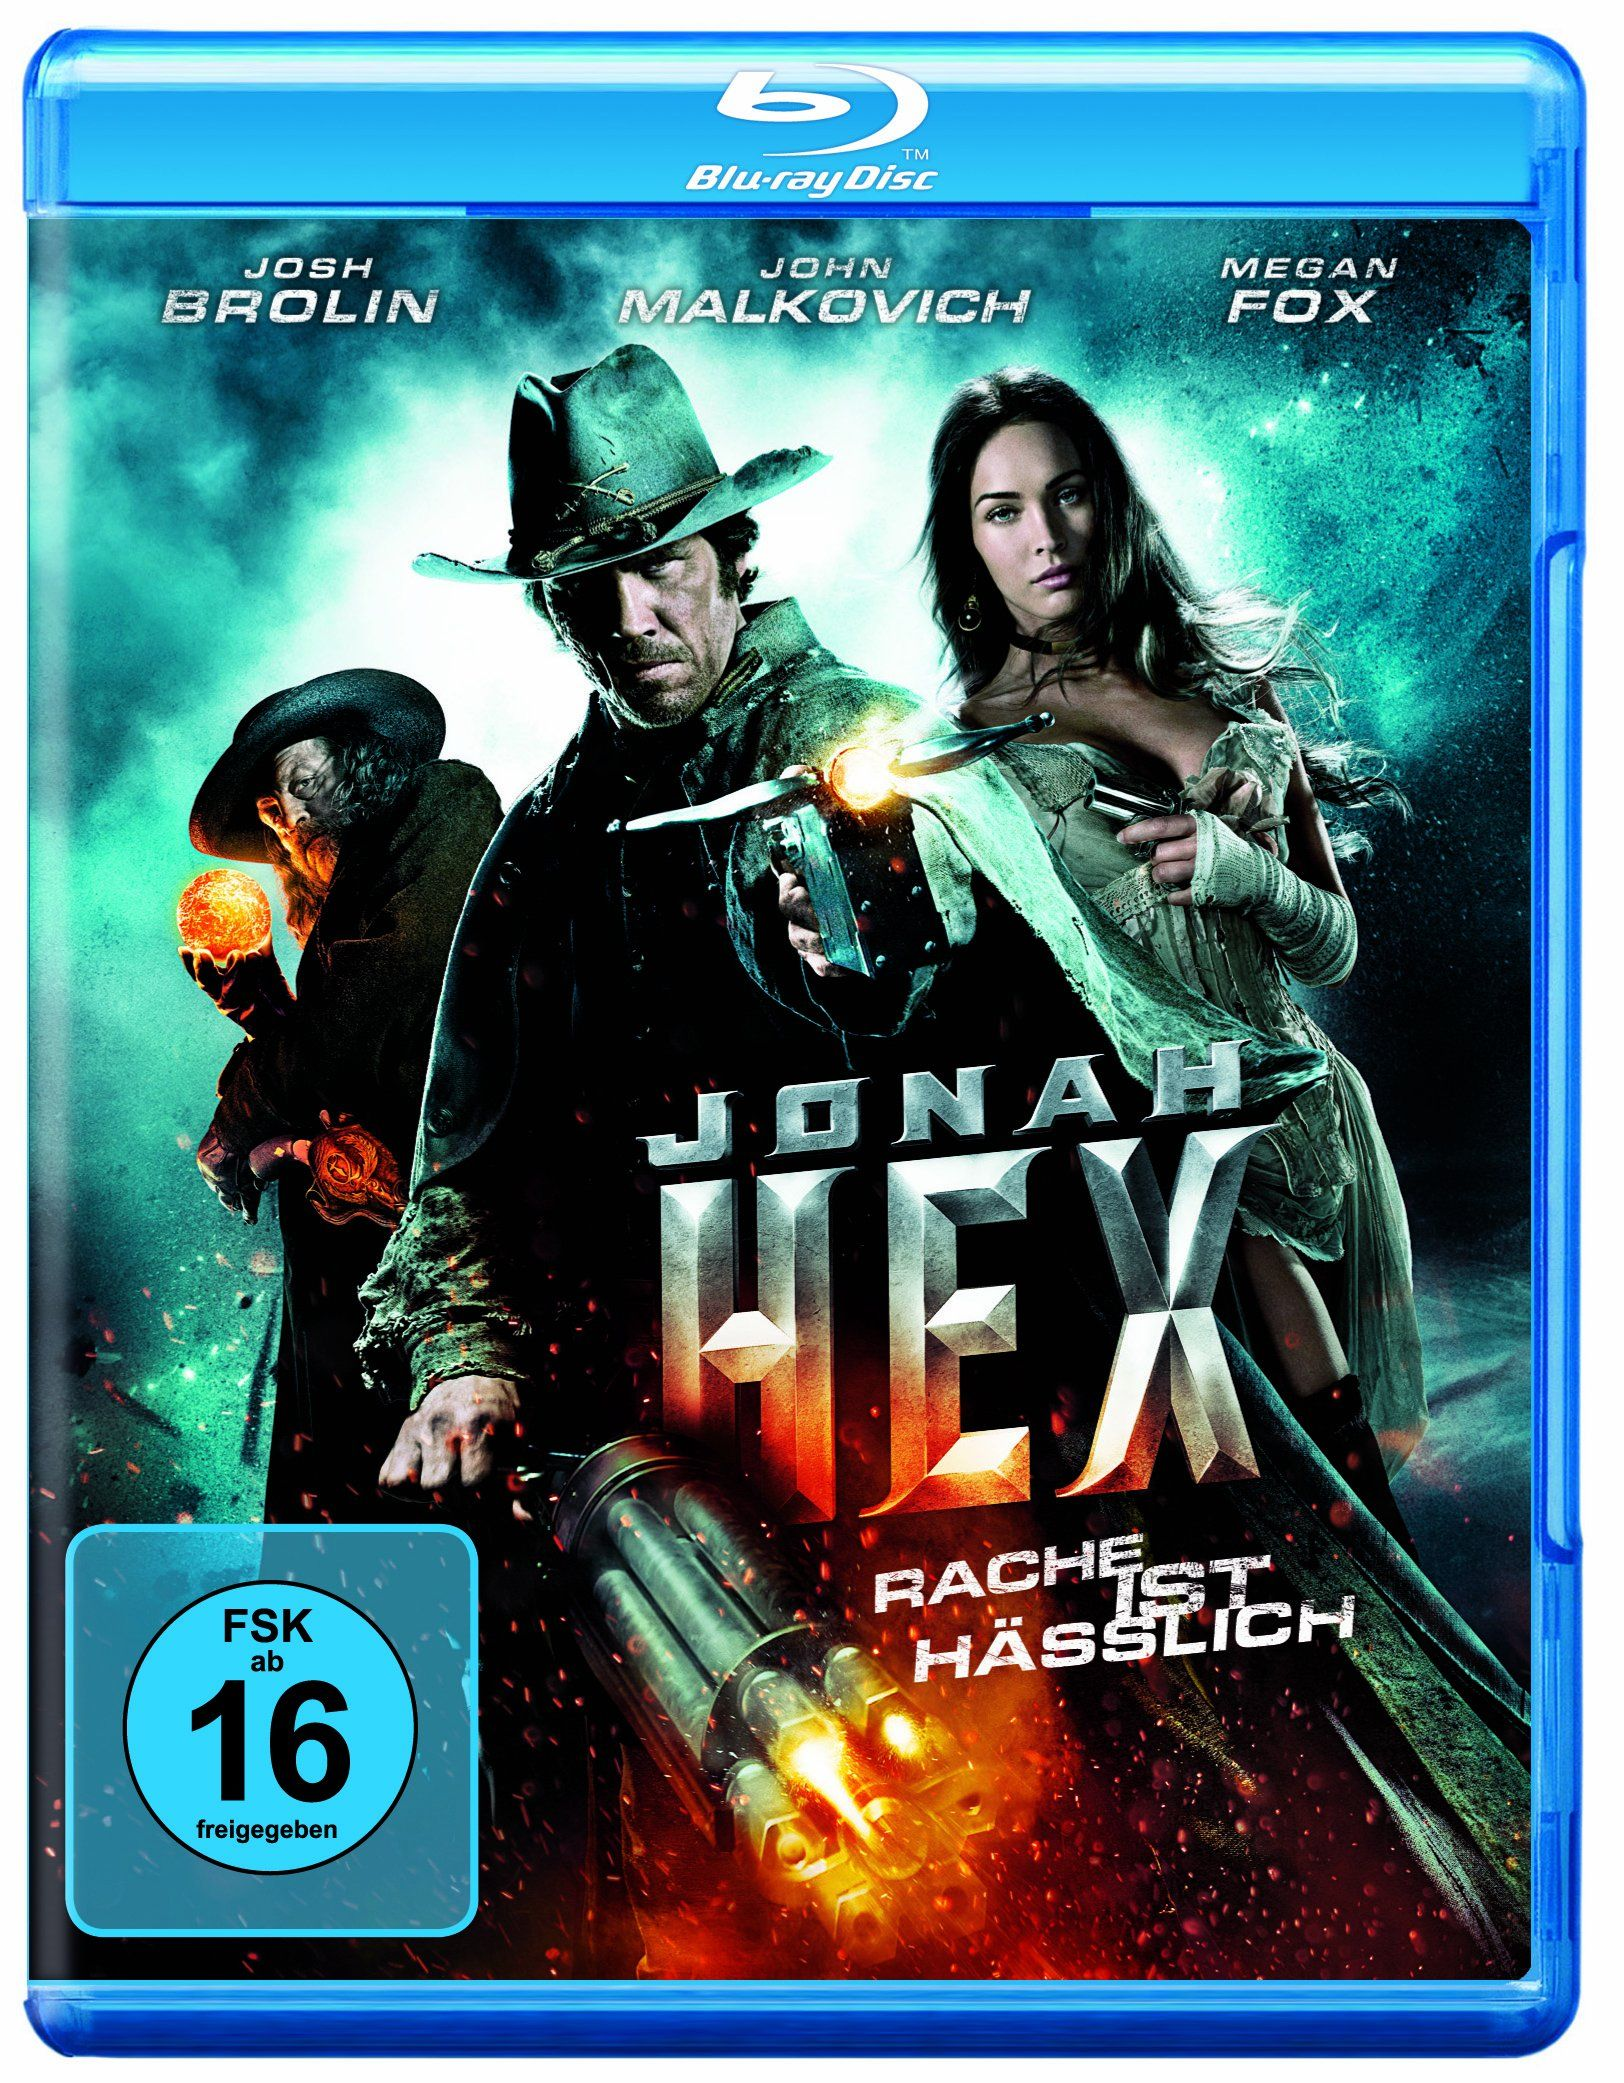 Jonah Hex Inkl Digital Copy Alemania Blu Ray Inkl Digital Jonah Hex Beruhmte Comics John Malkovich Kopfgeldjager